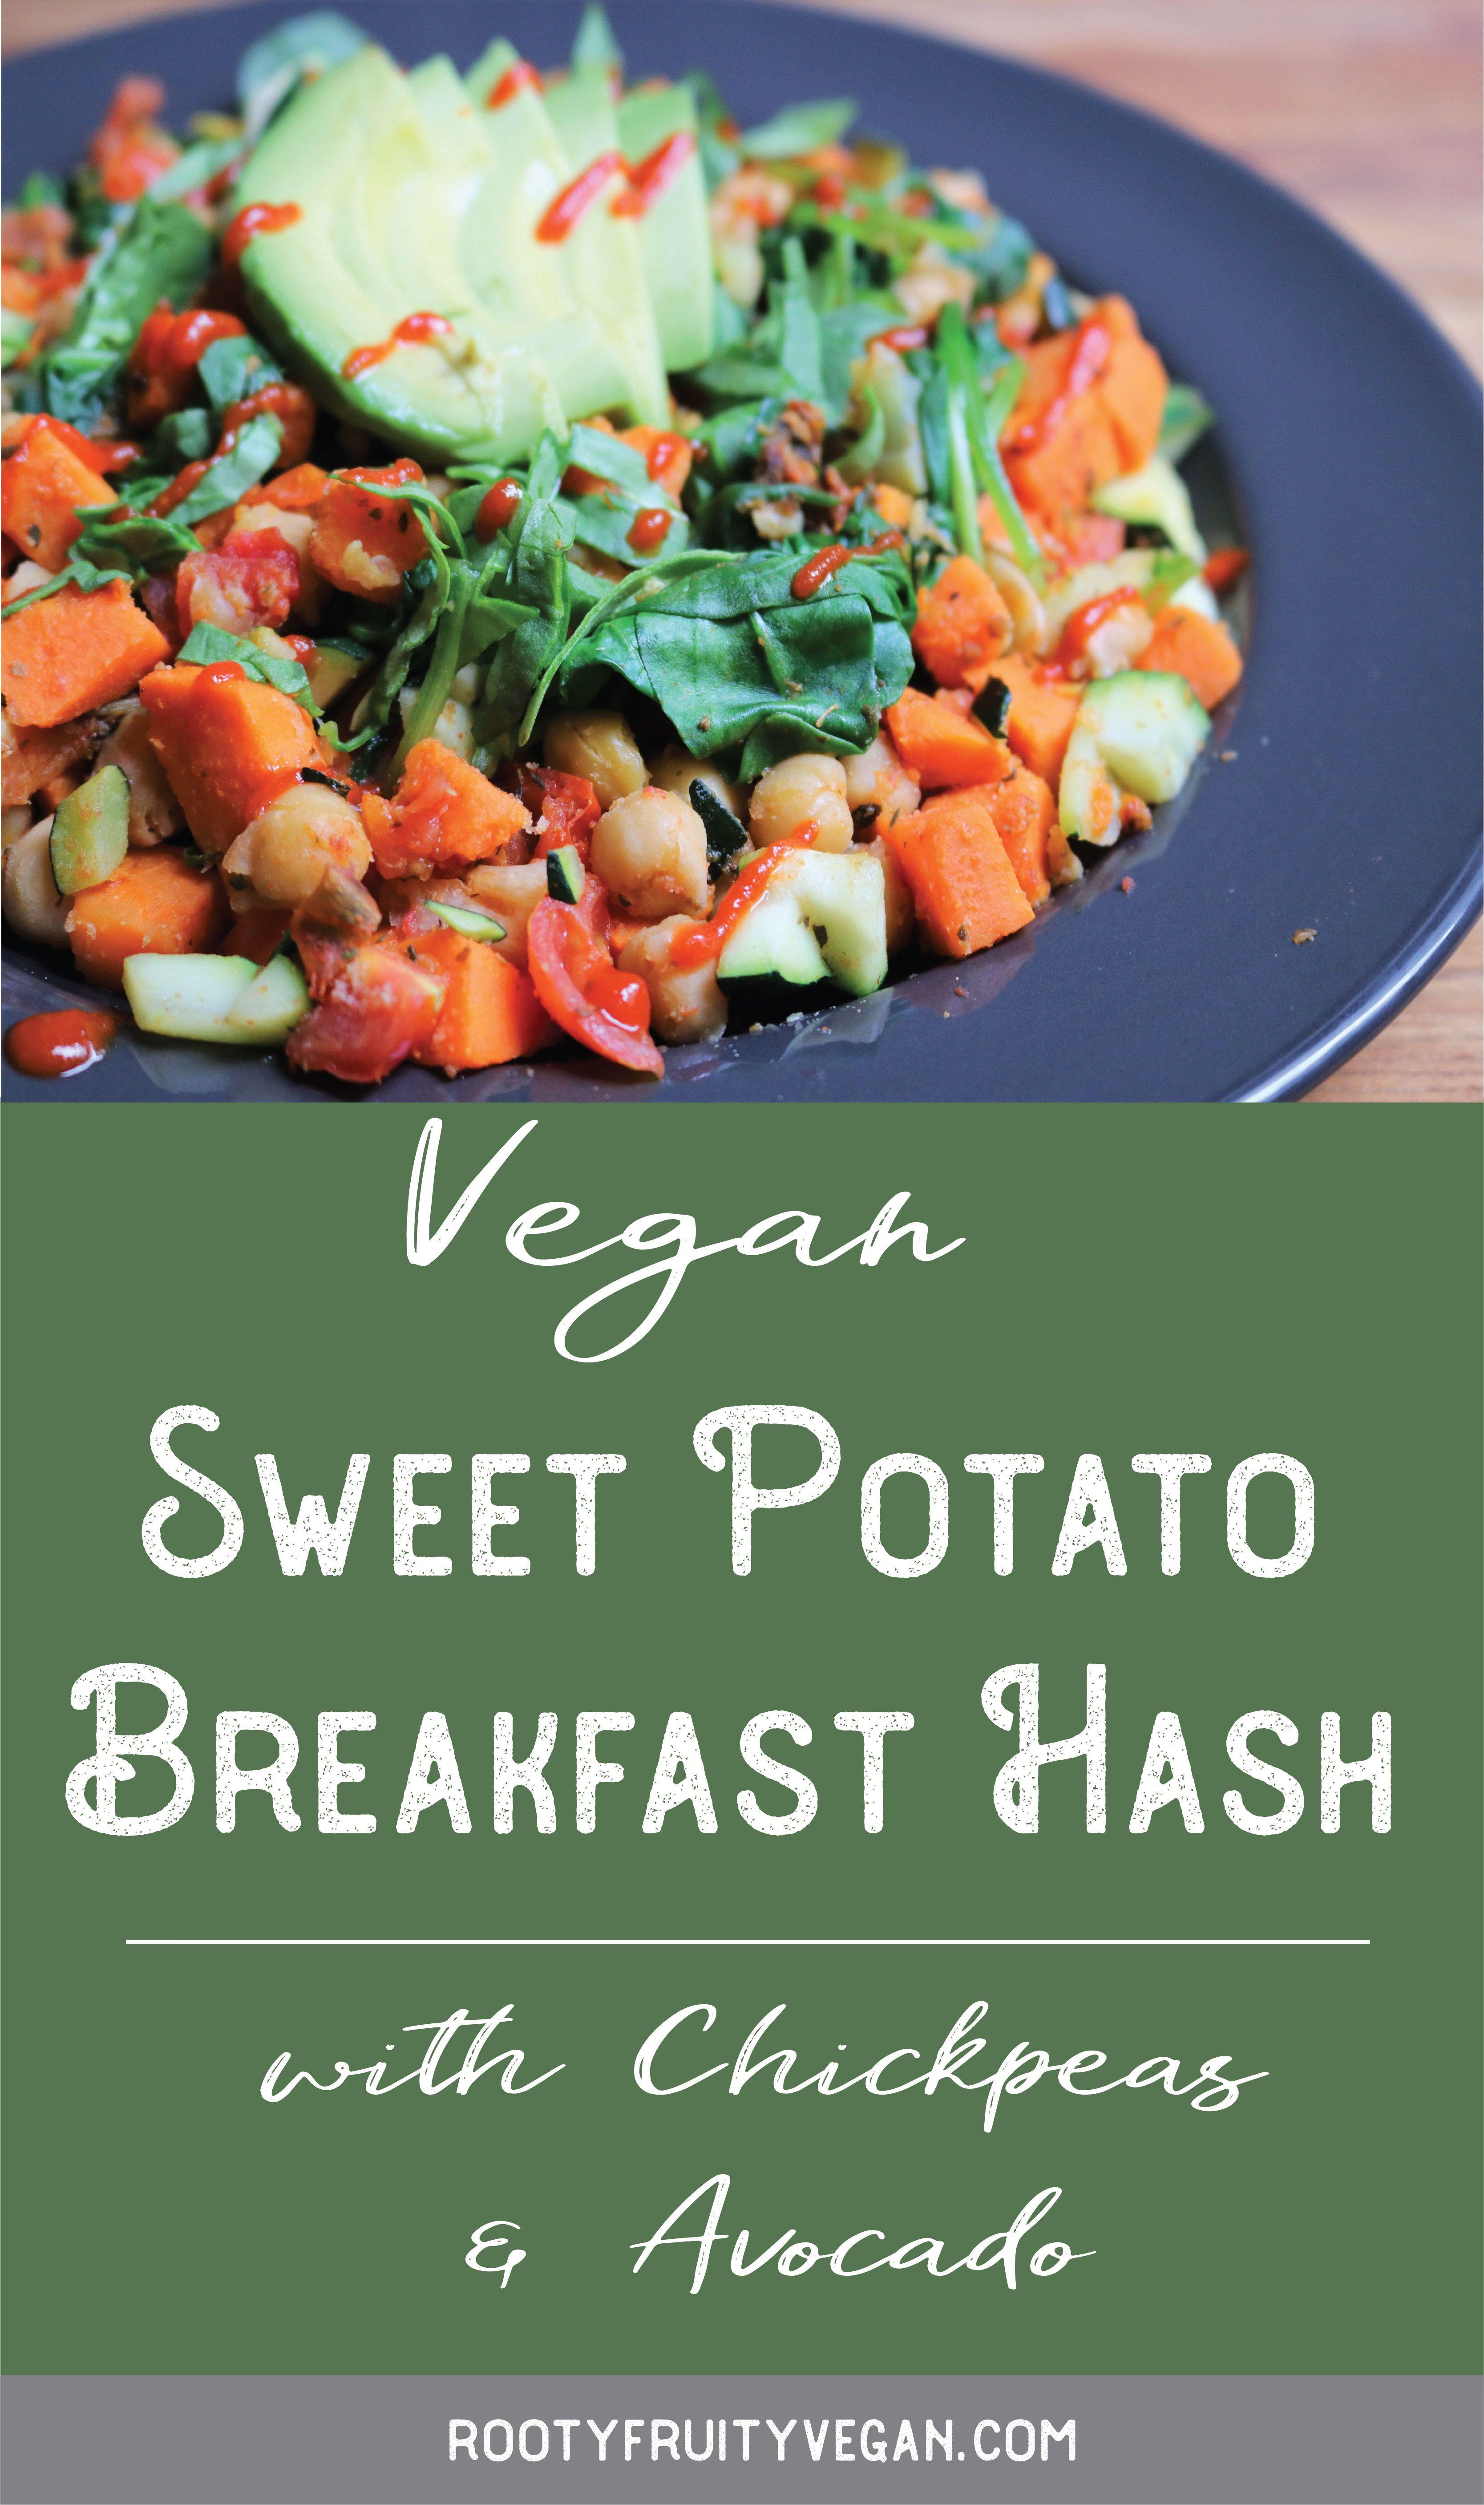 Vegan Tofu Breakfast Sandwich Recipe In 2020 With Images Sweet Potato Breakfast Hash Vegan Sweet Potato Vegan Recipes Healthy